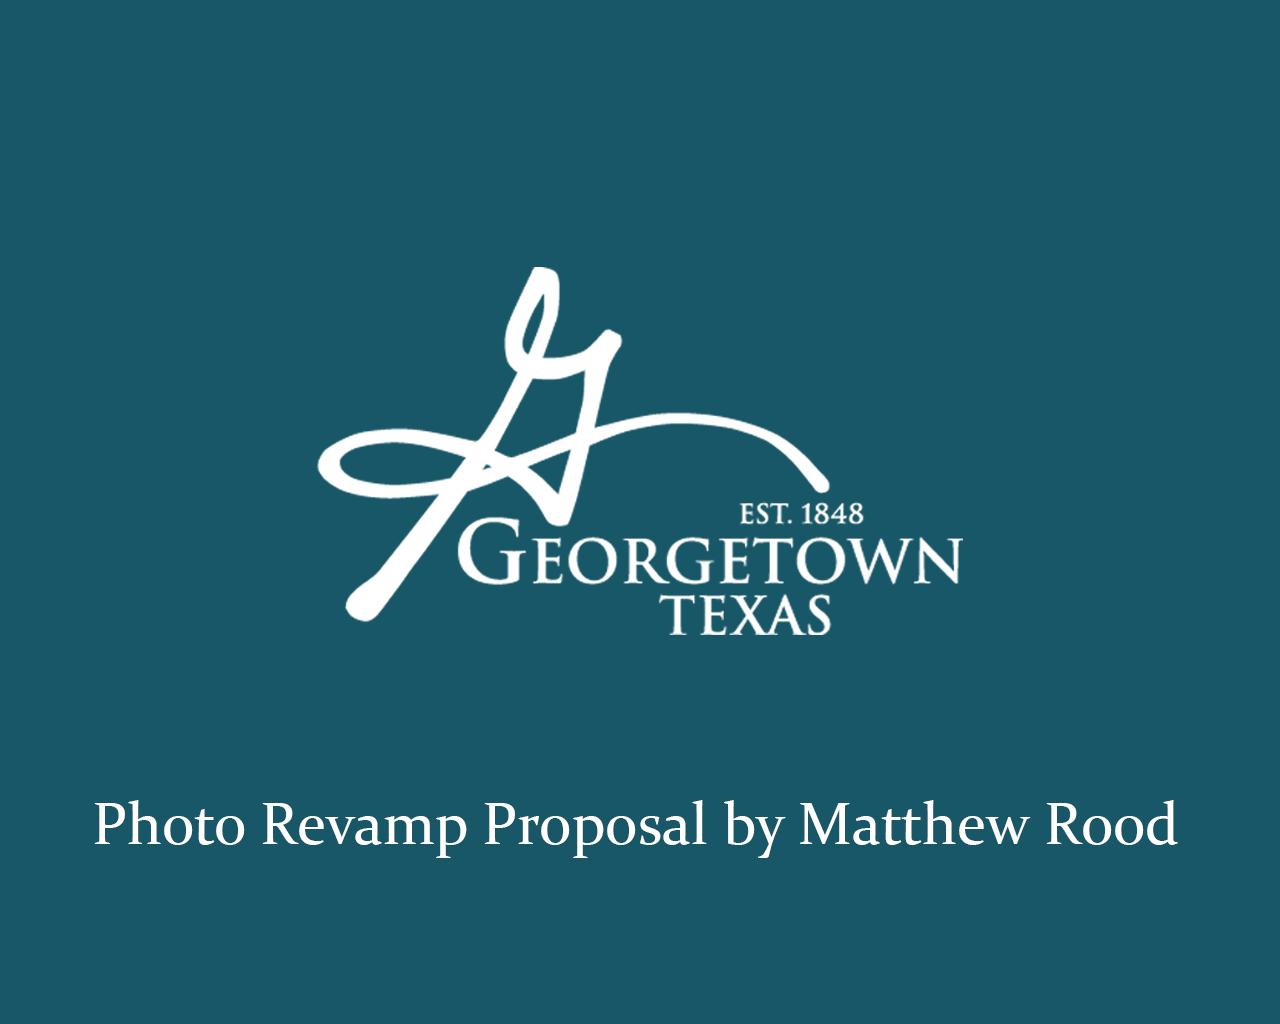 City of Georgetown Photo Revamp Proposal - Title Slide.jpg